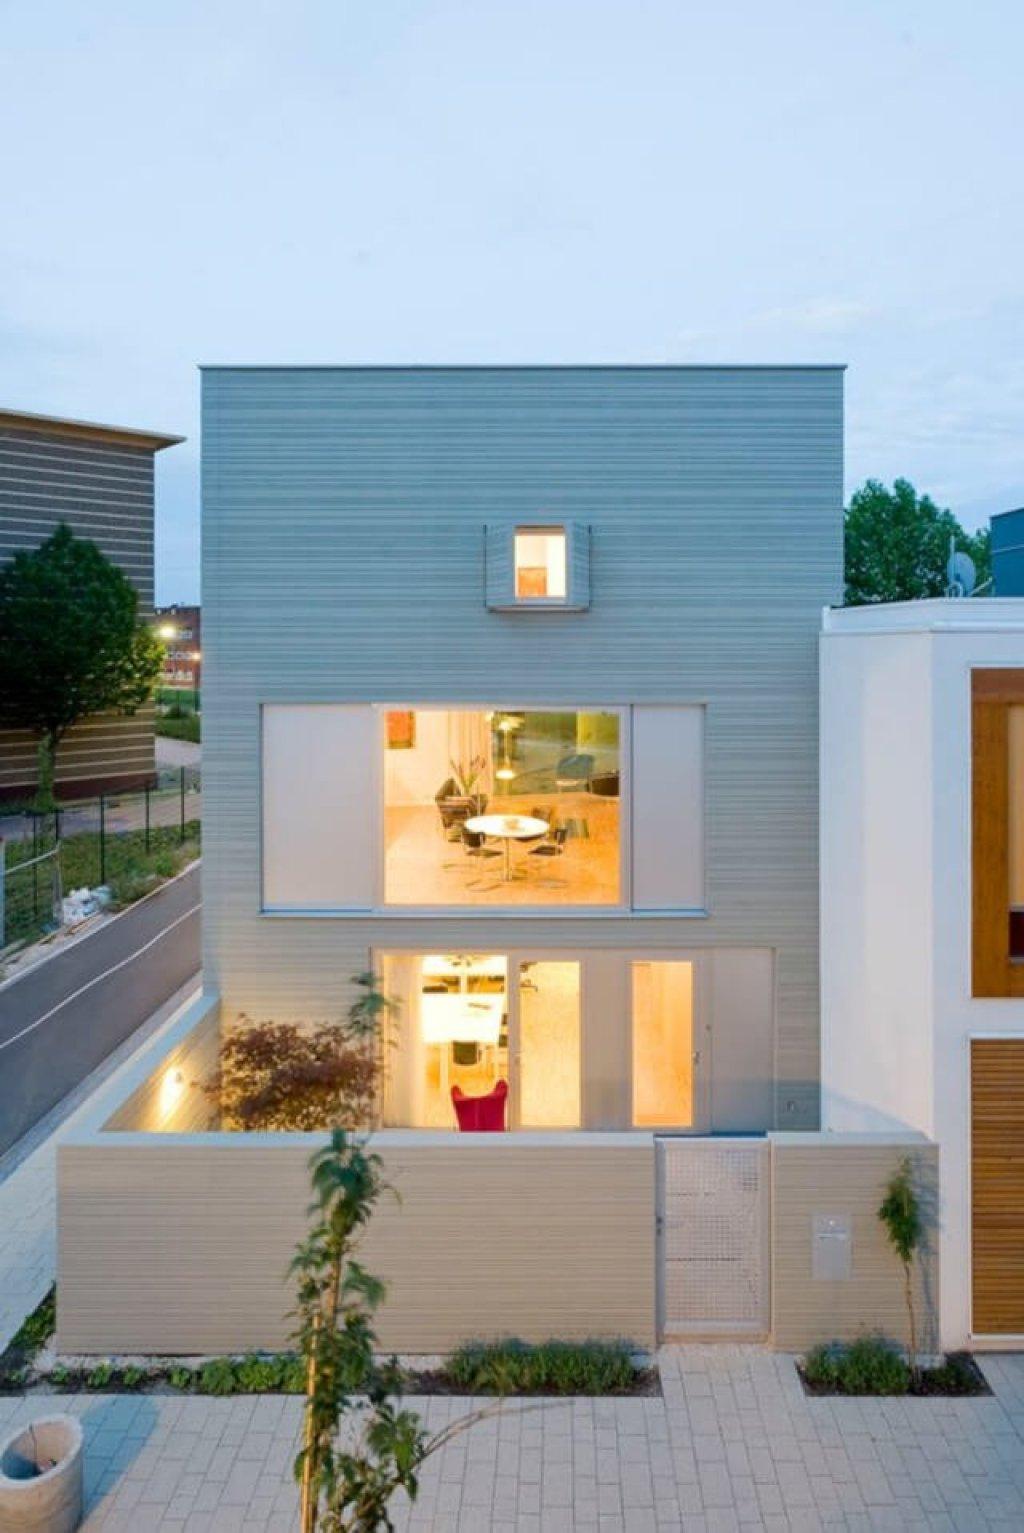 foto desain fasad rumah minimalis 2 lantai